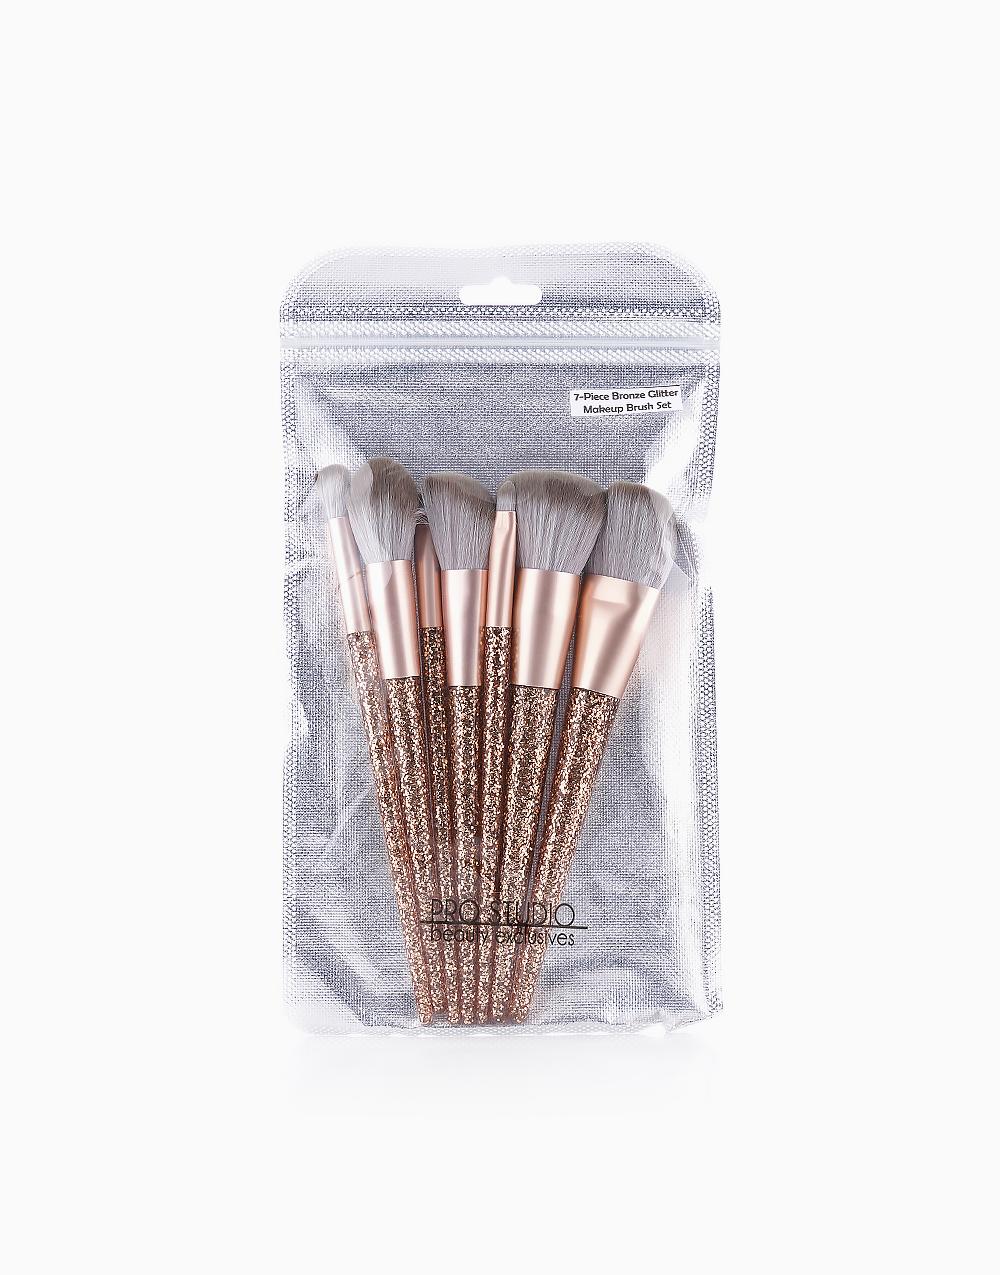 7-Piece Bronze Glitter Makeup Brush Set by PRO STUDIO Beauty Exclusives